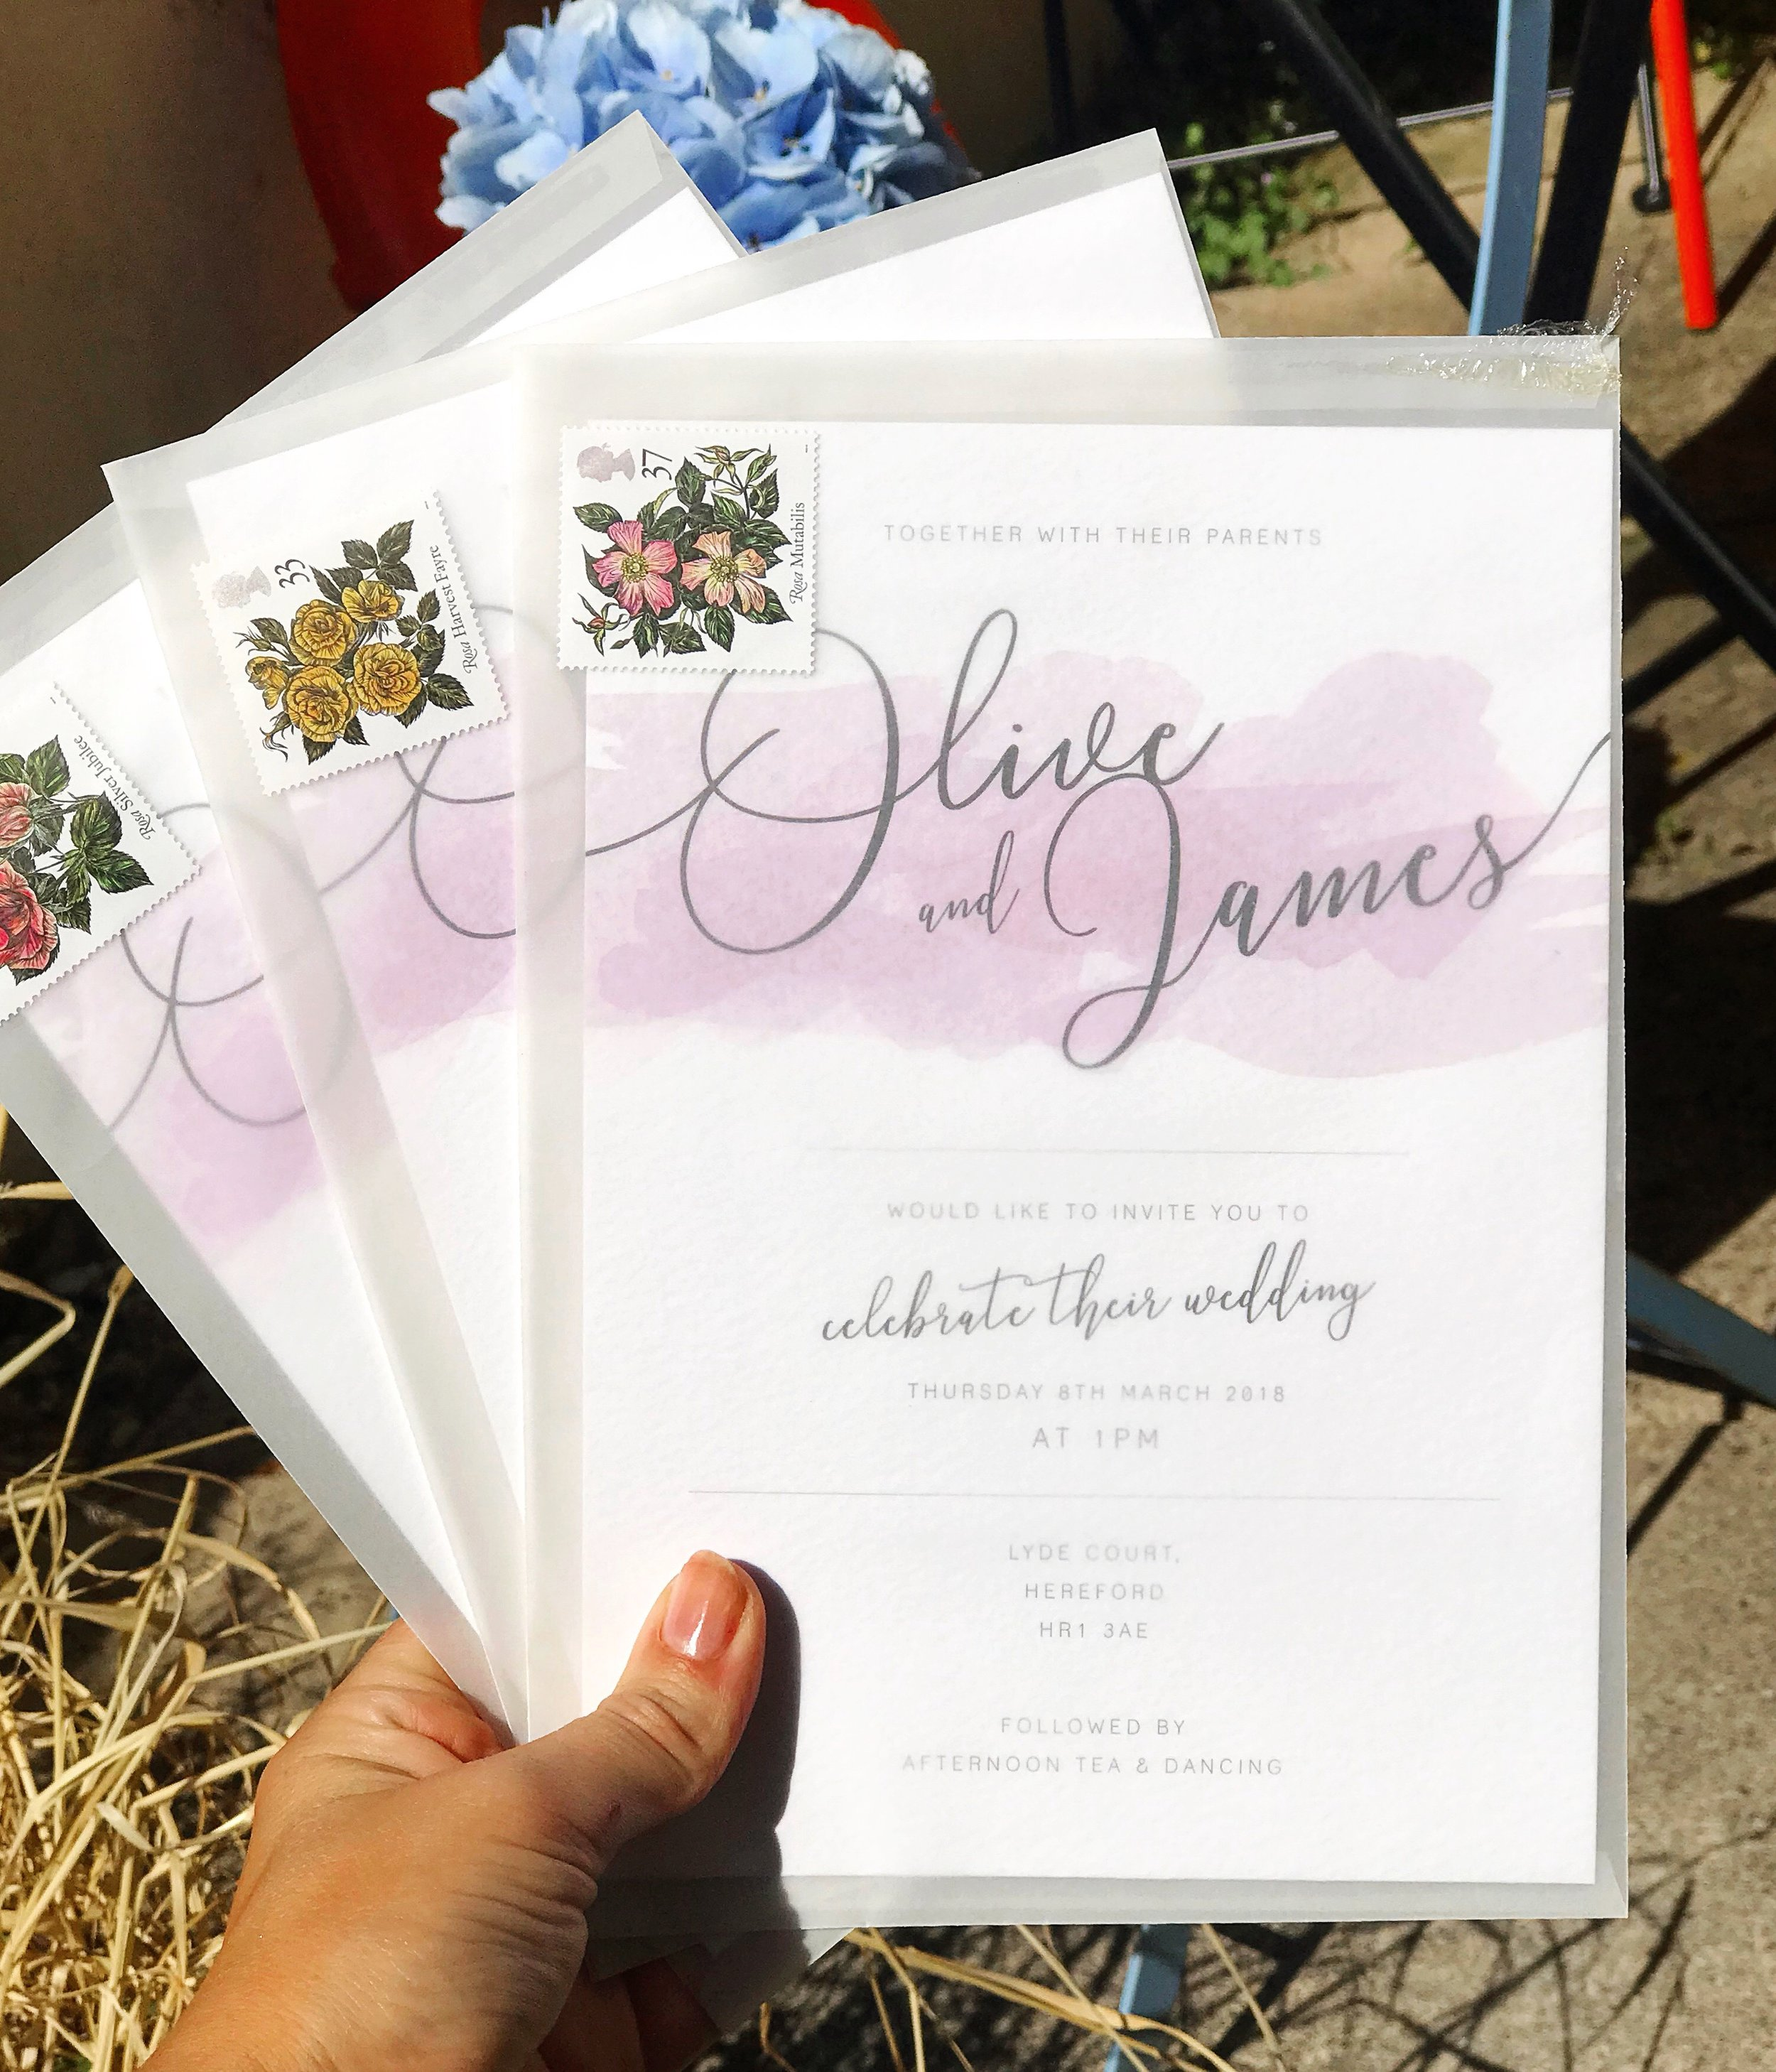 colour-splash-watercolour-wedding-invite-the-ink-closet-transparent-envelopes.JPG